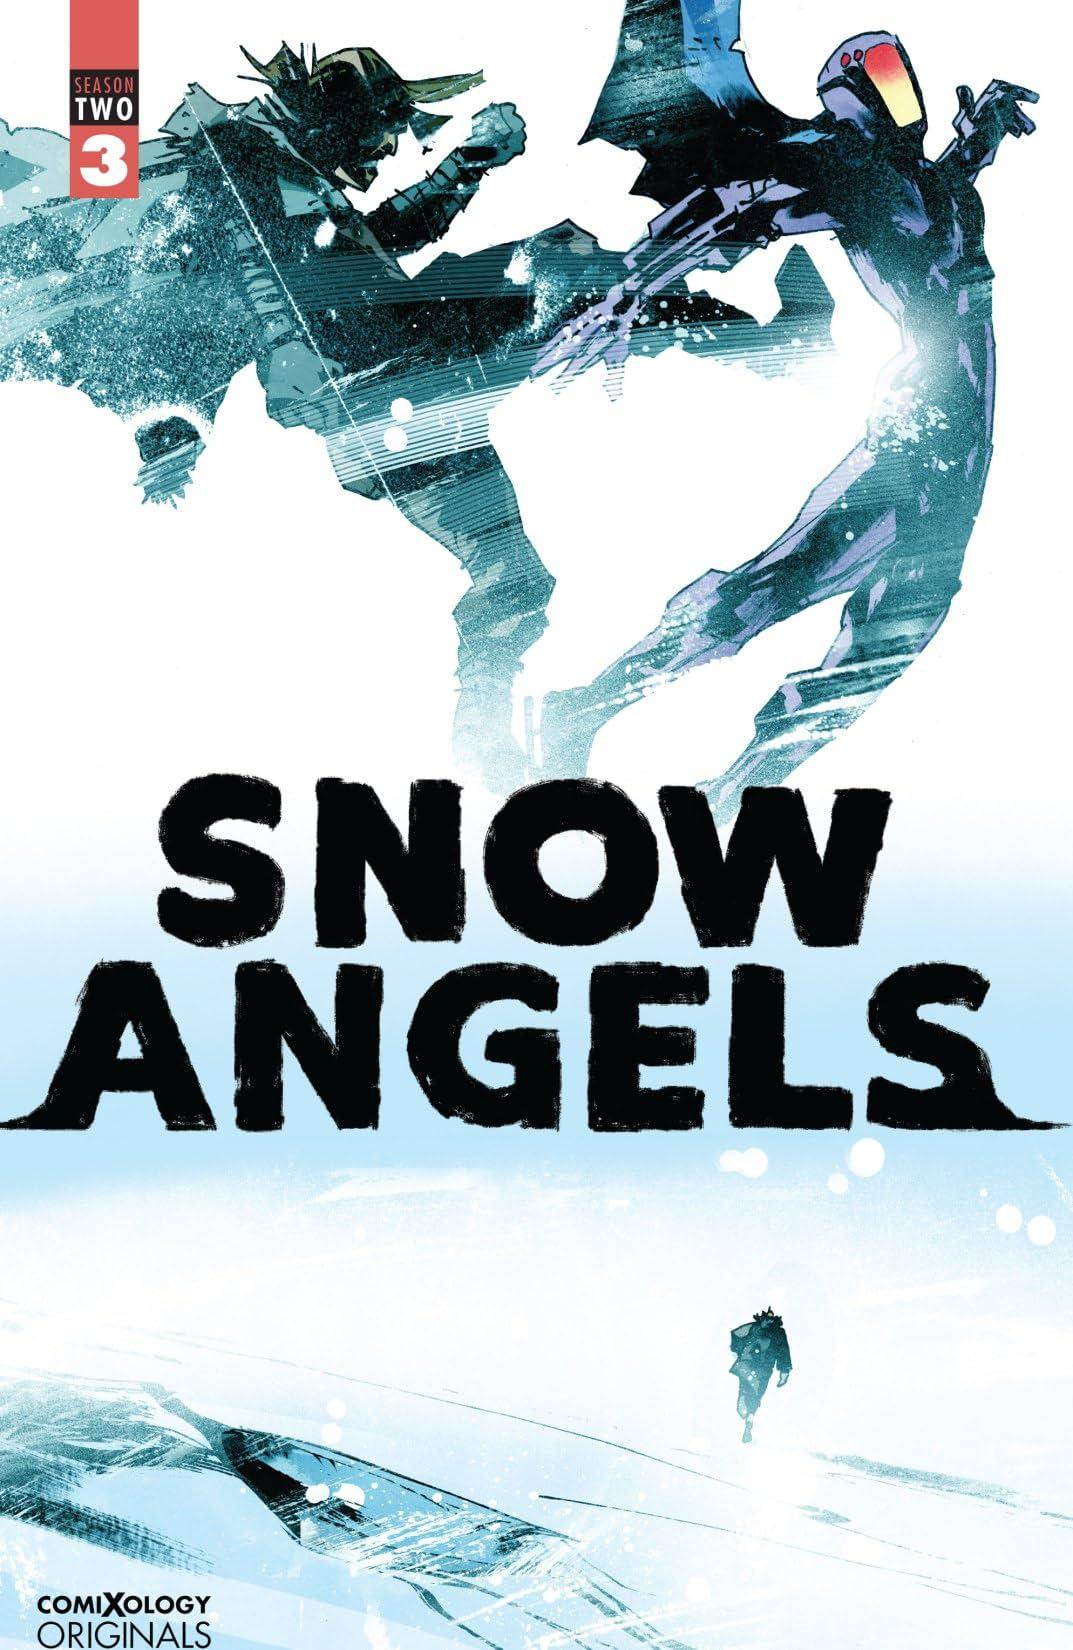 Snow Angels Season Two (comiXology Originals) #3